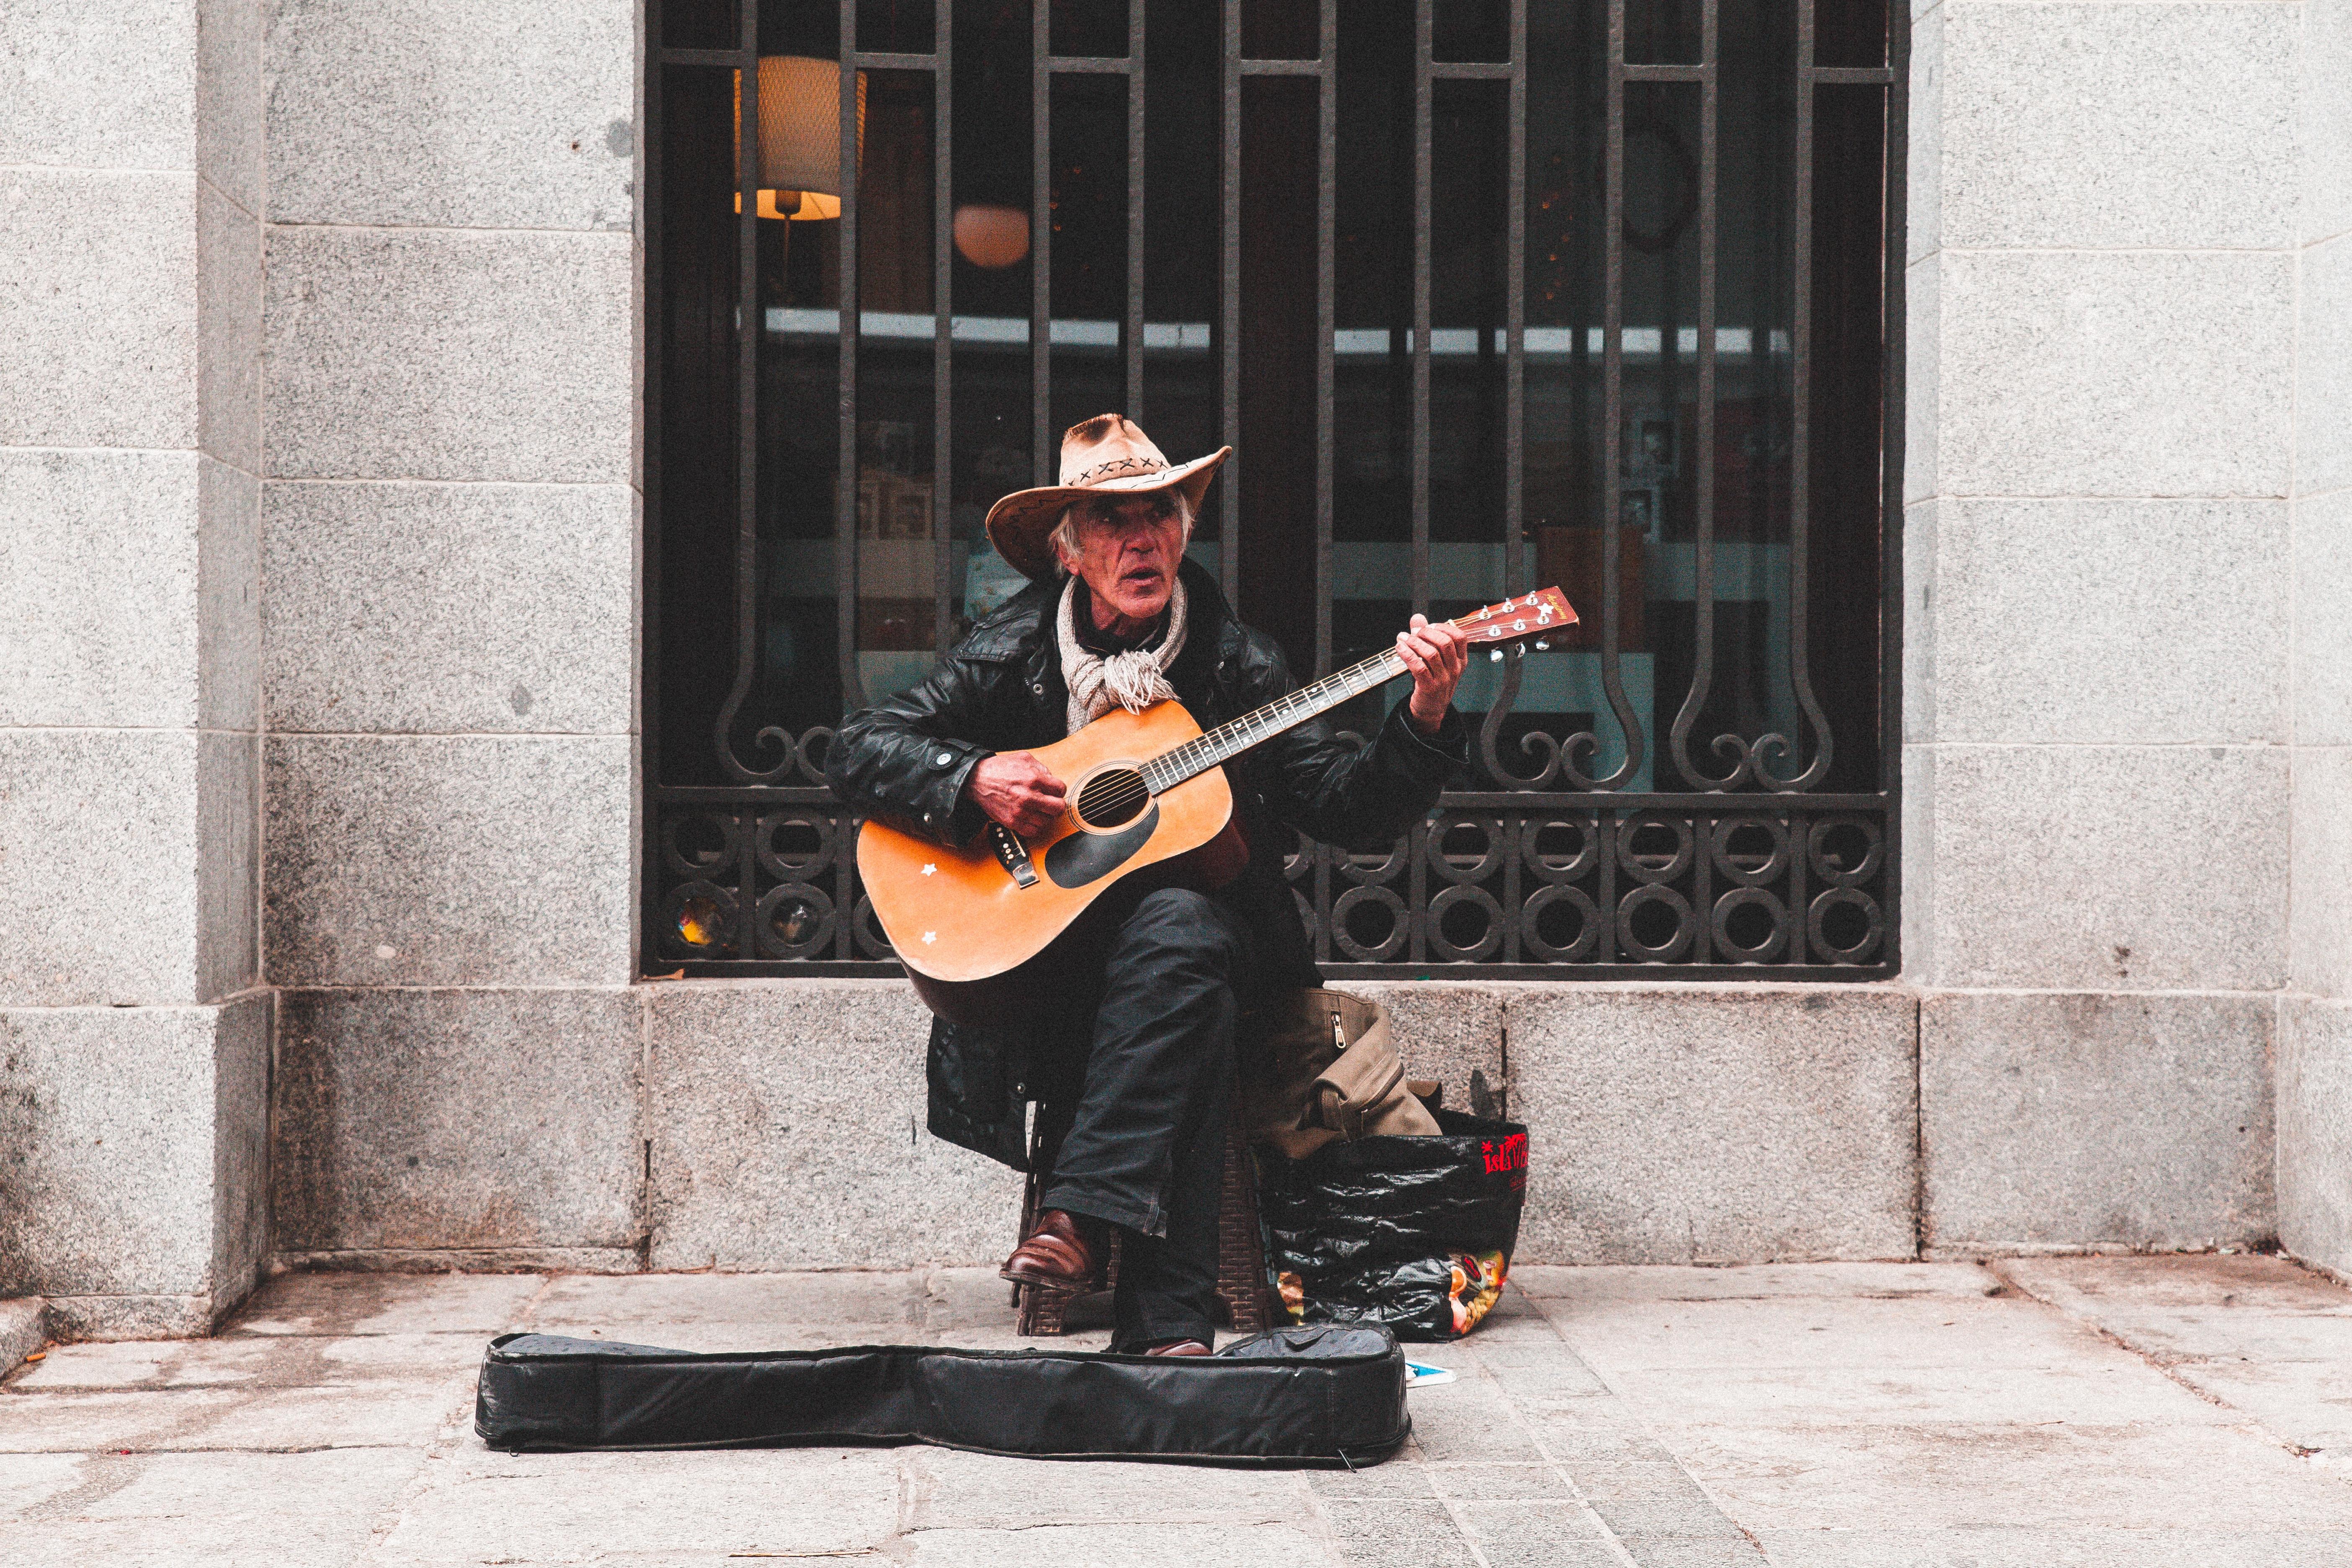 man sitting on chair playing guitar